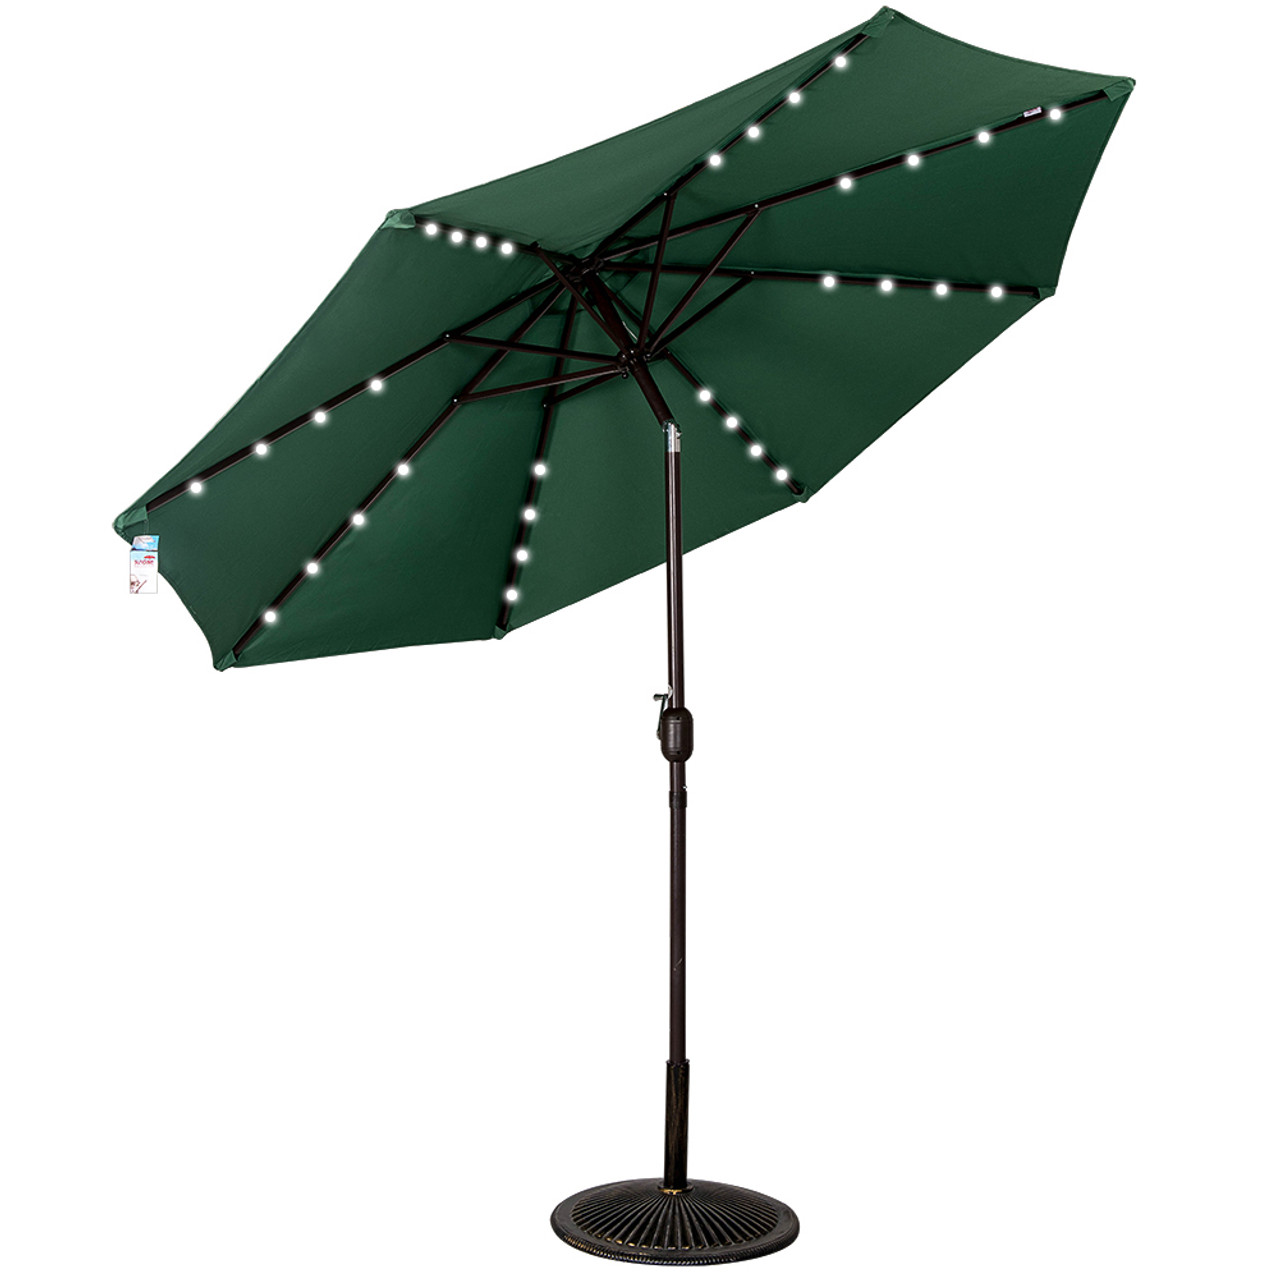 Solar Powered 32 LED Lighted Outdoor Patio Umbrella with Crank and Tilt, 9  Feet, - Rectangular Solar Powered 22 LED Lighted Outdoor Patio Umbrella